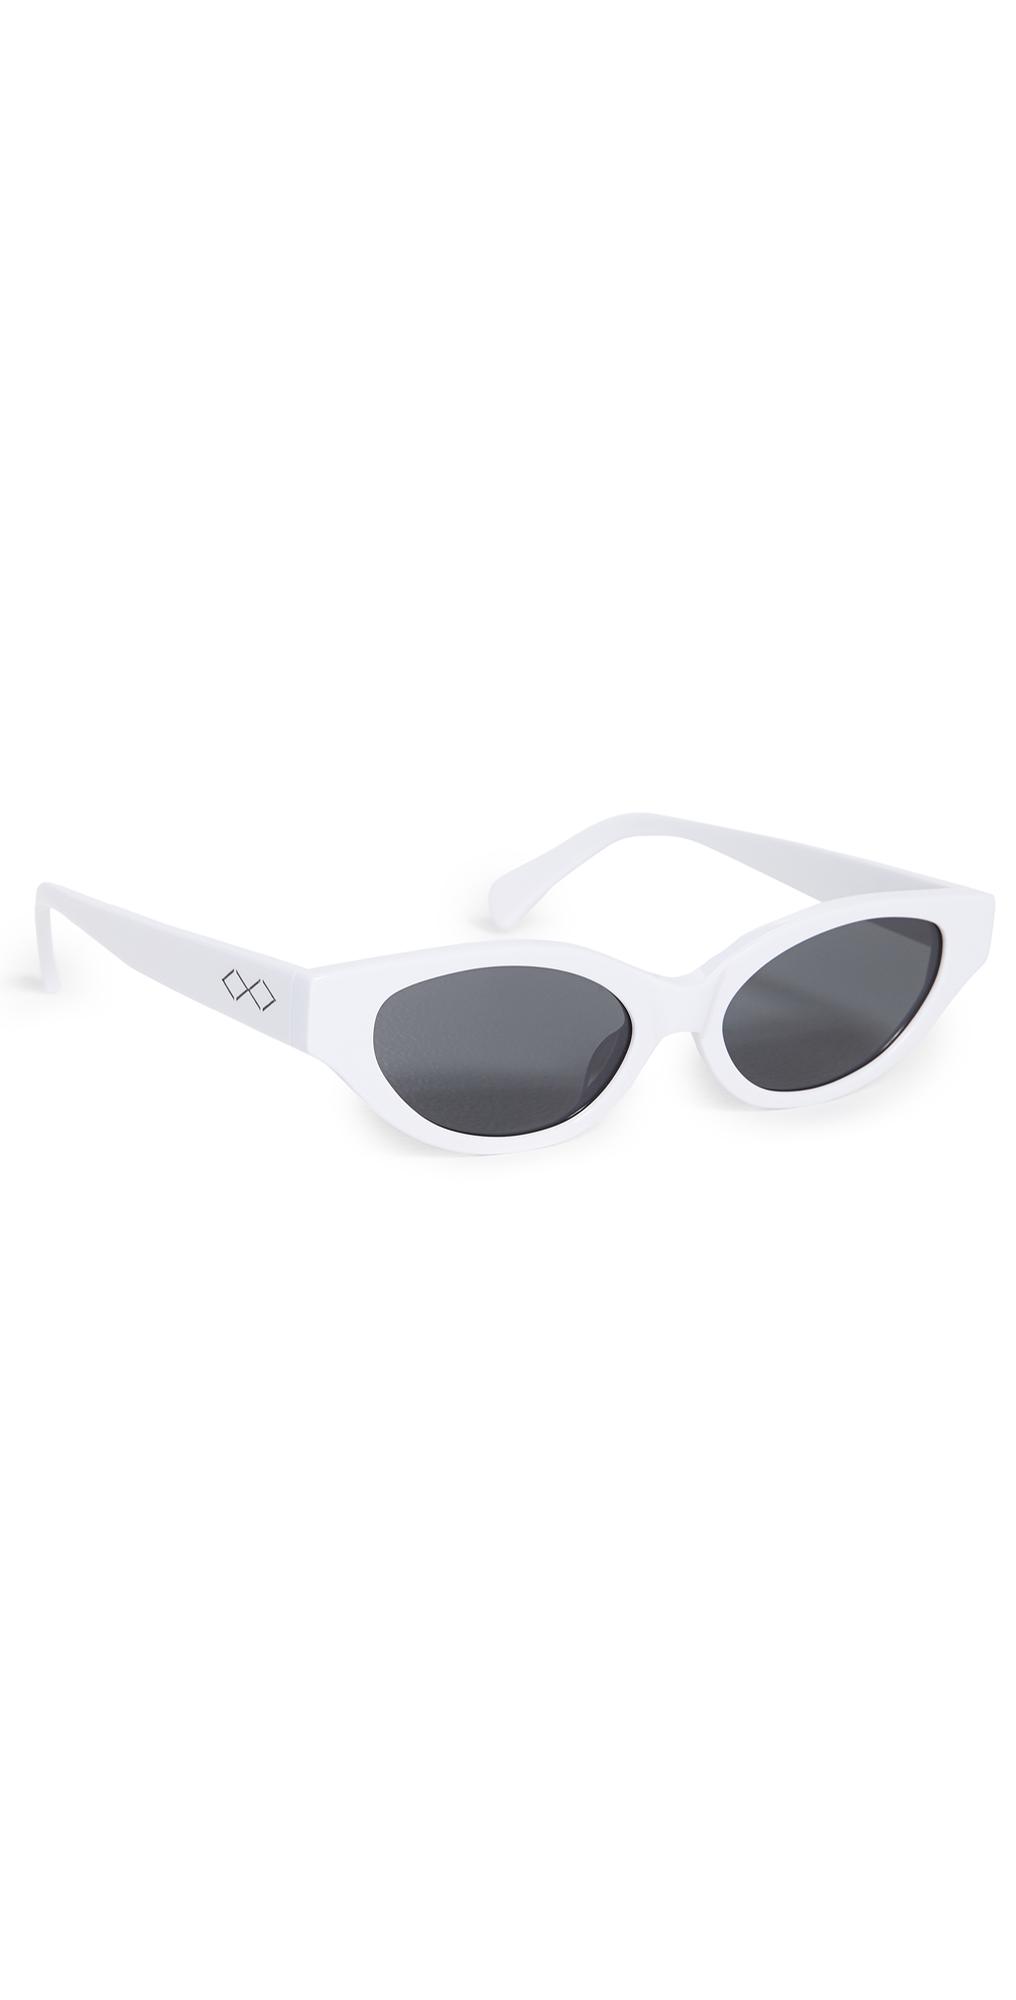 The Glamorous Sunglasses